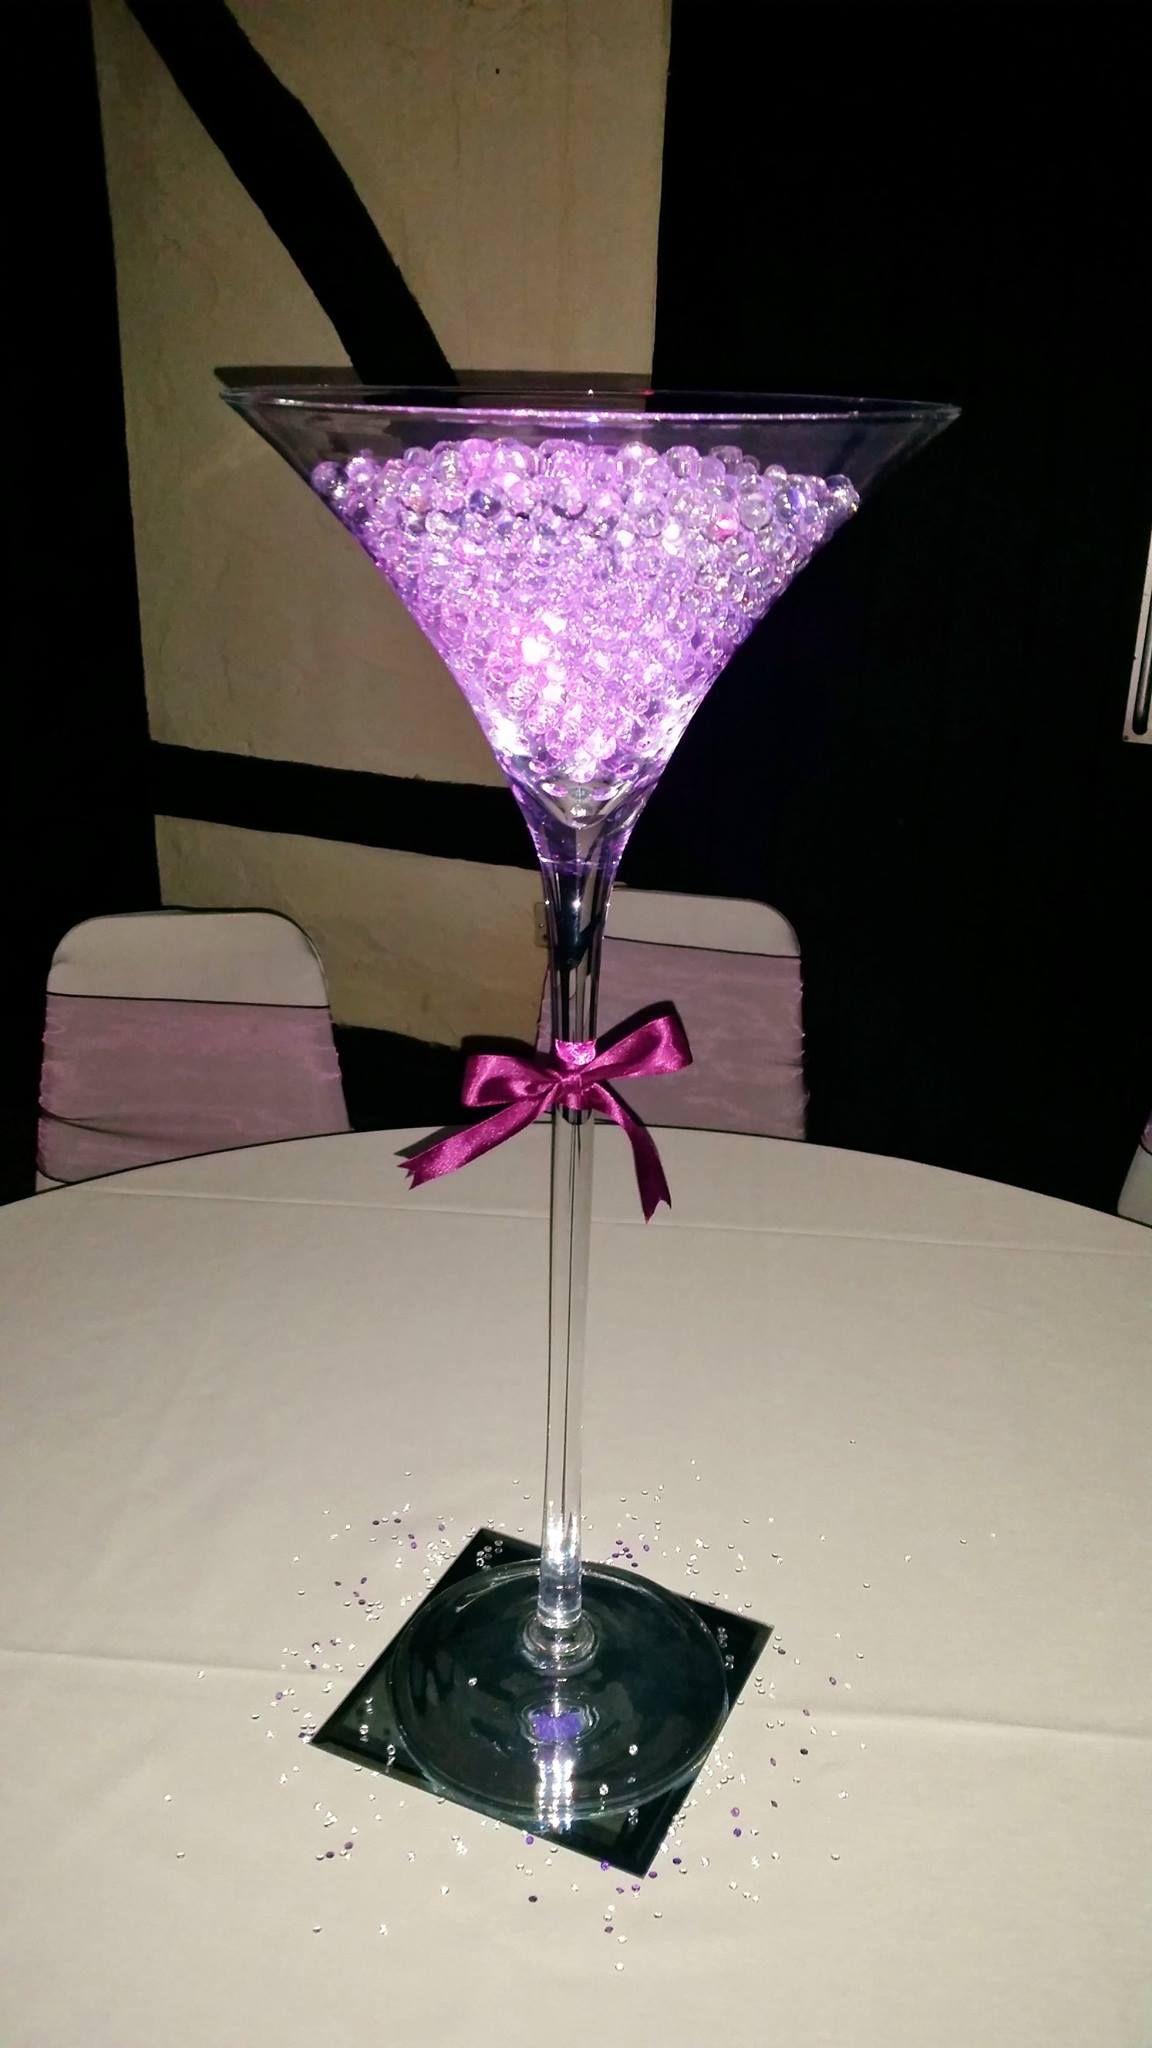 Sororio Events - Large Martini Glass - Centre Piece - Dark Purple - Wedding - www.sororioevents.co.uk